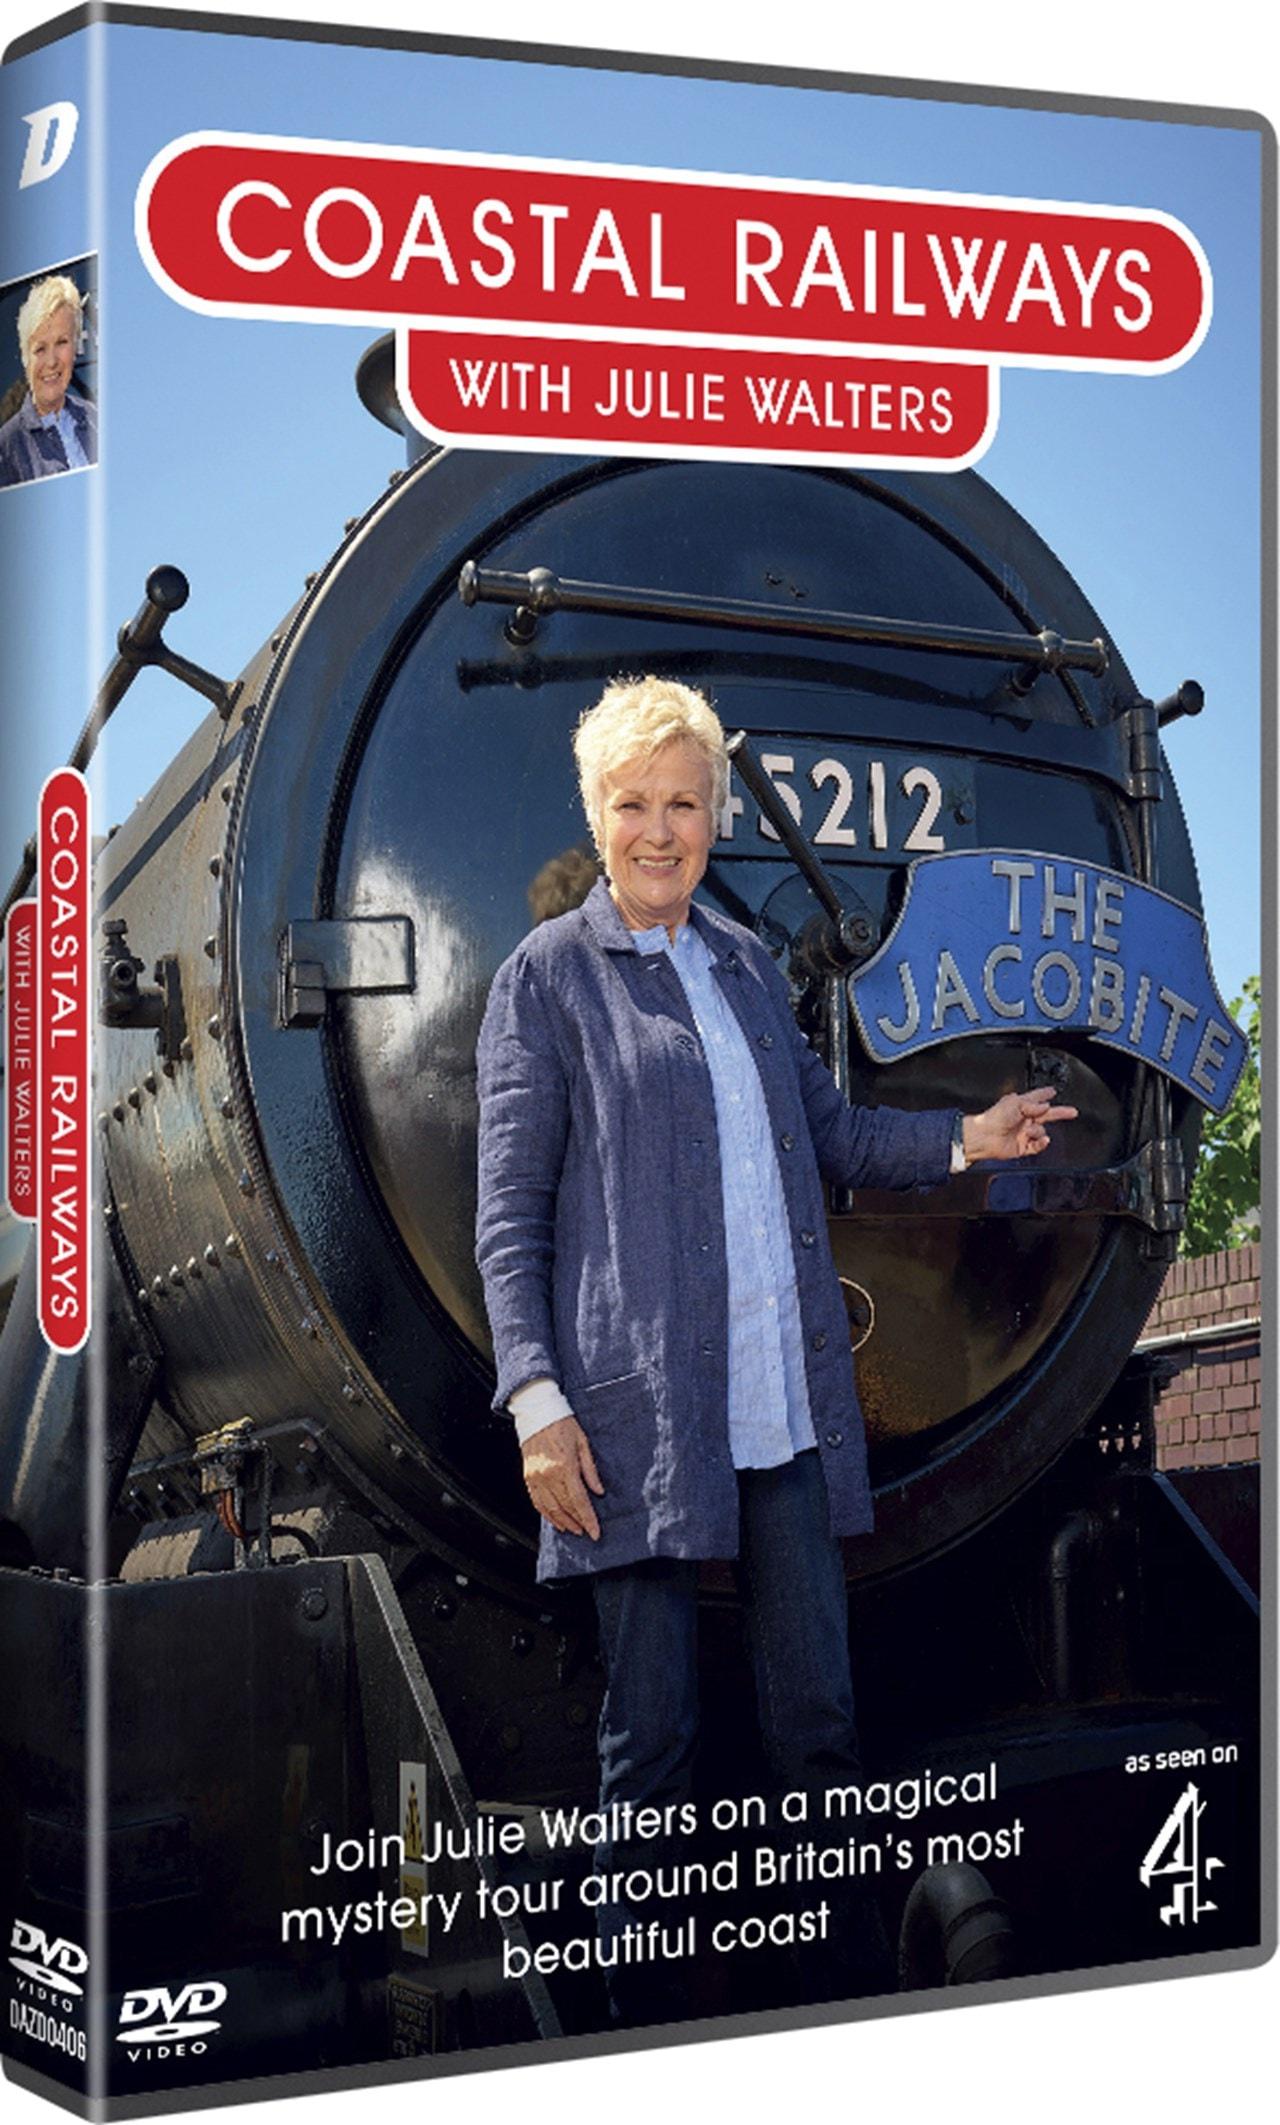 Coastal Railways With Julie Walters - 2